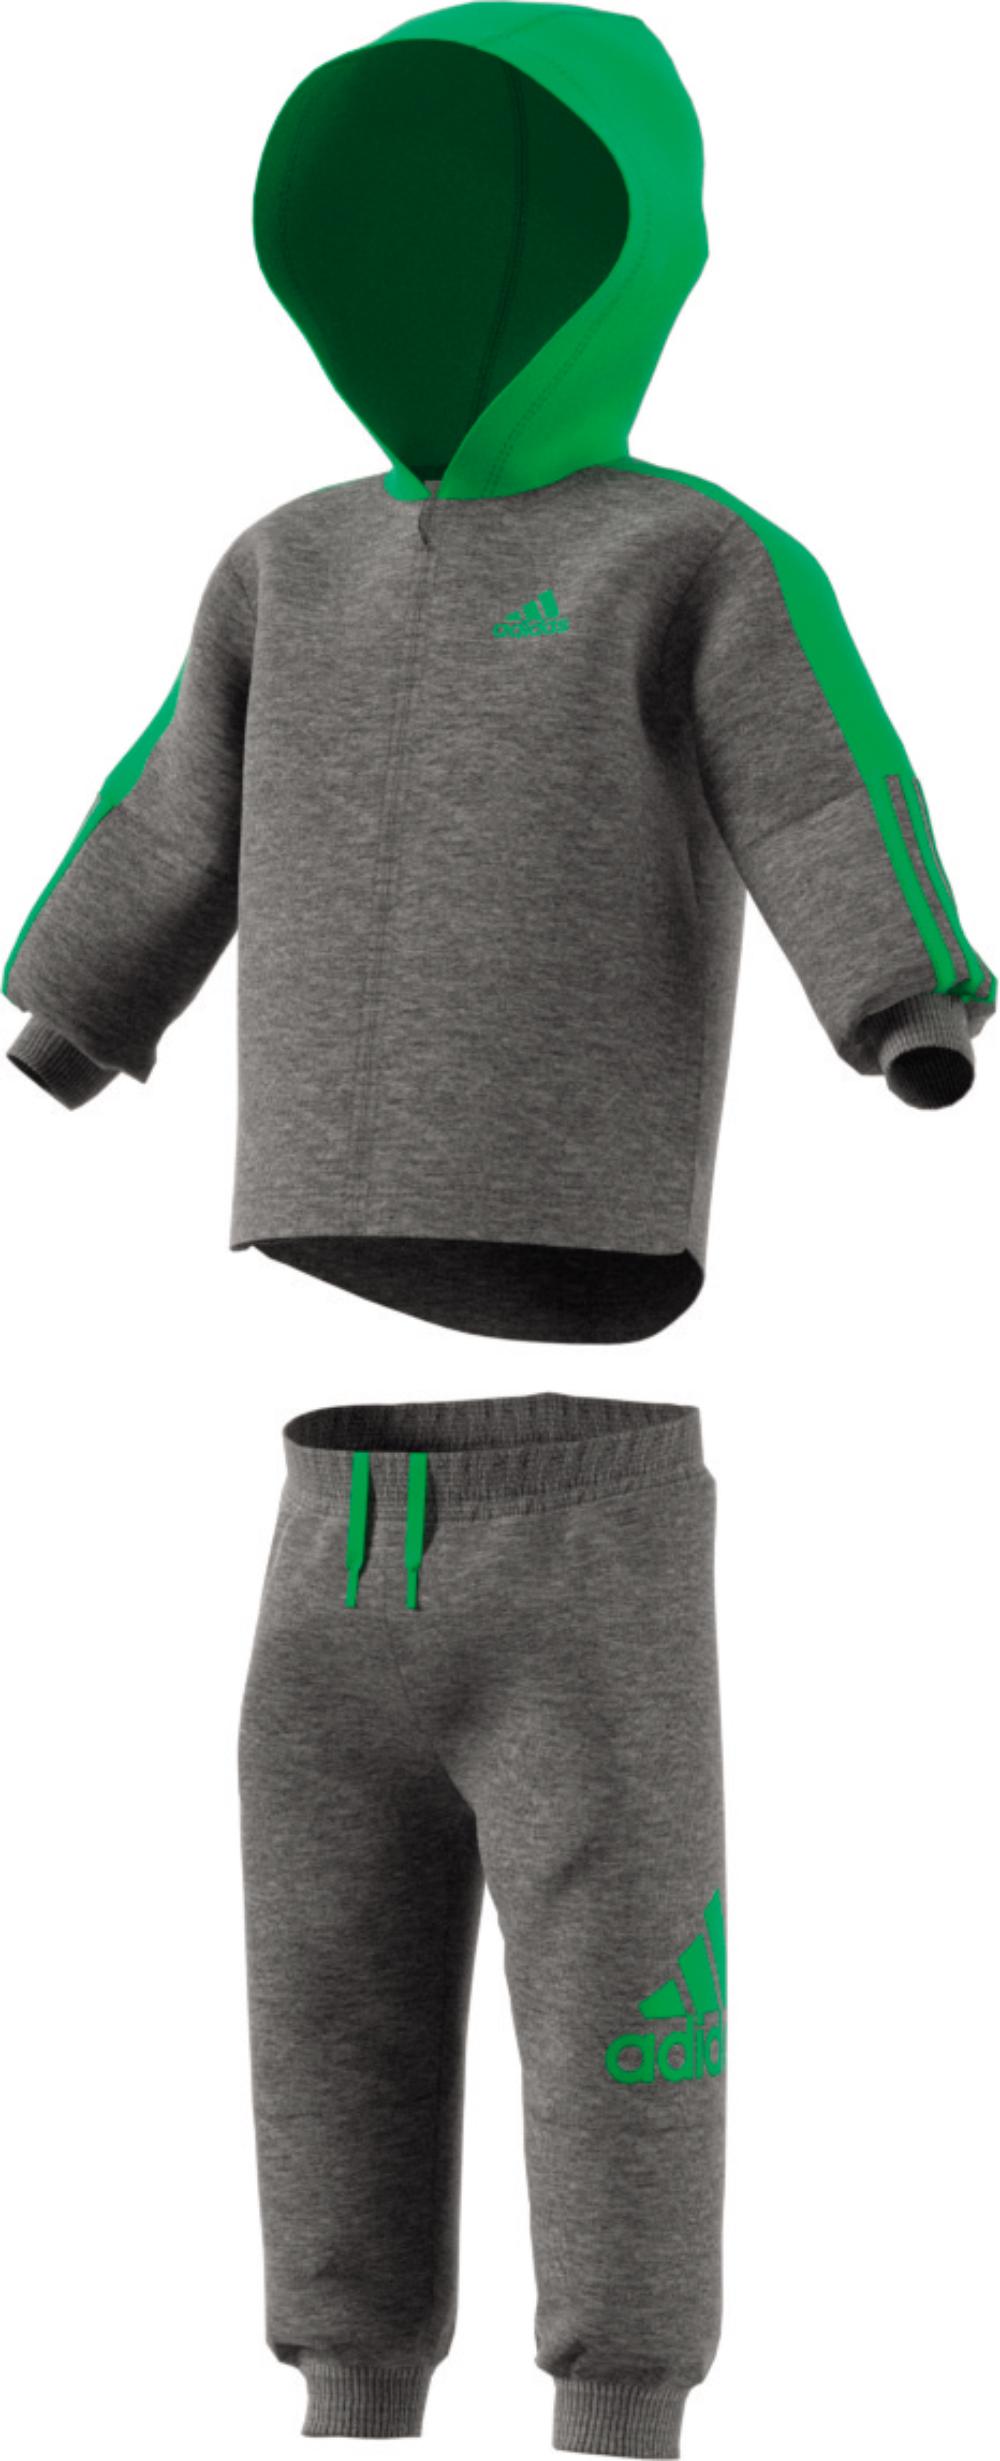 Jogginganzug Trainingsanzug Kinder Grau